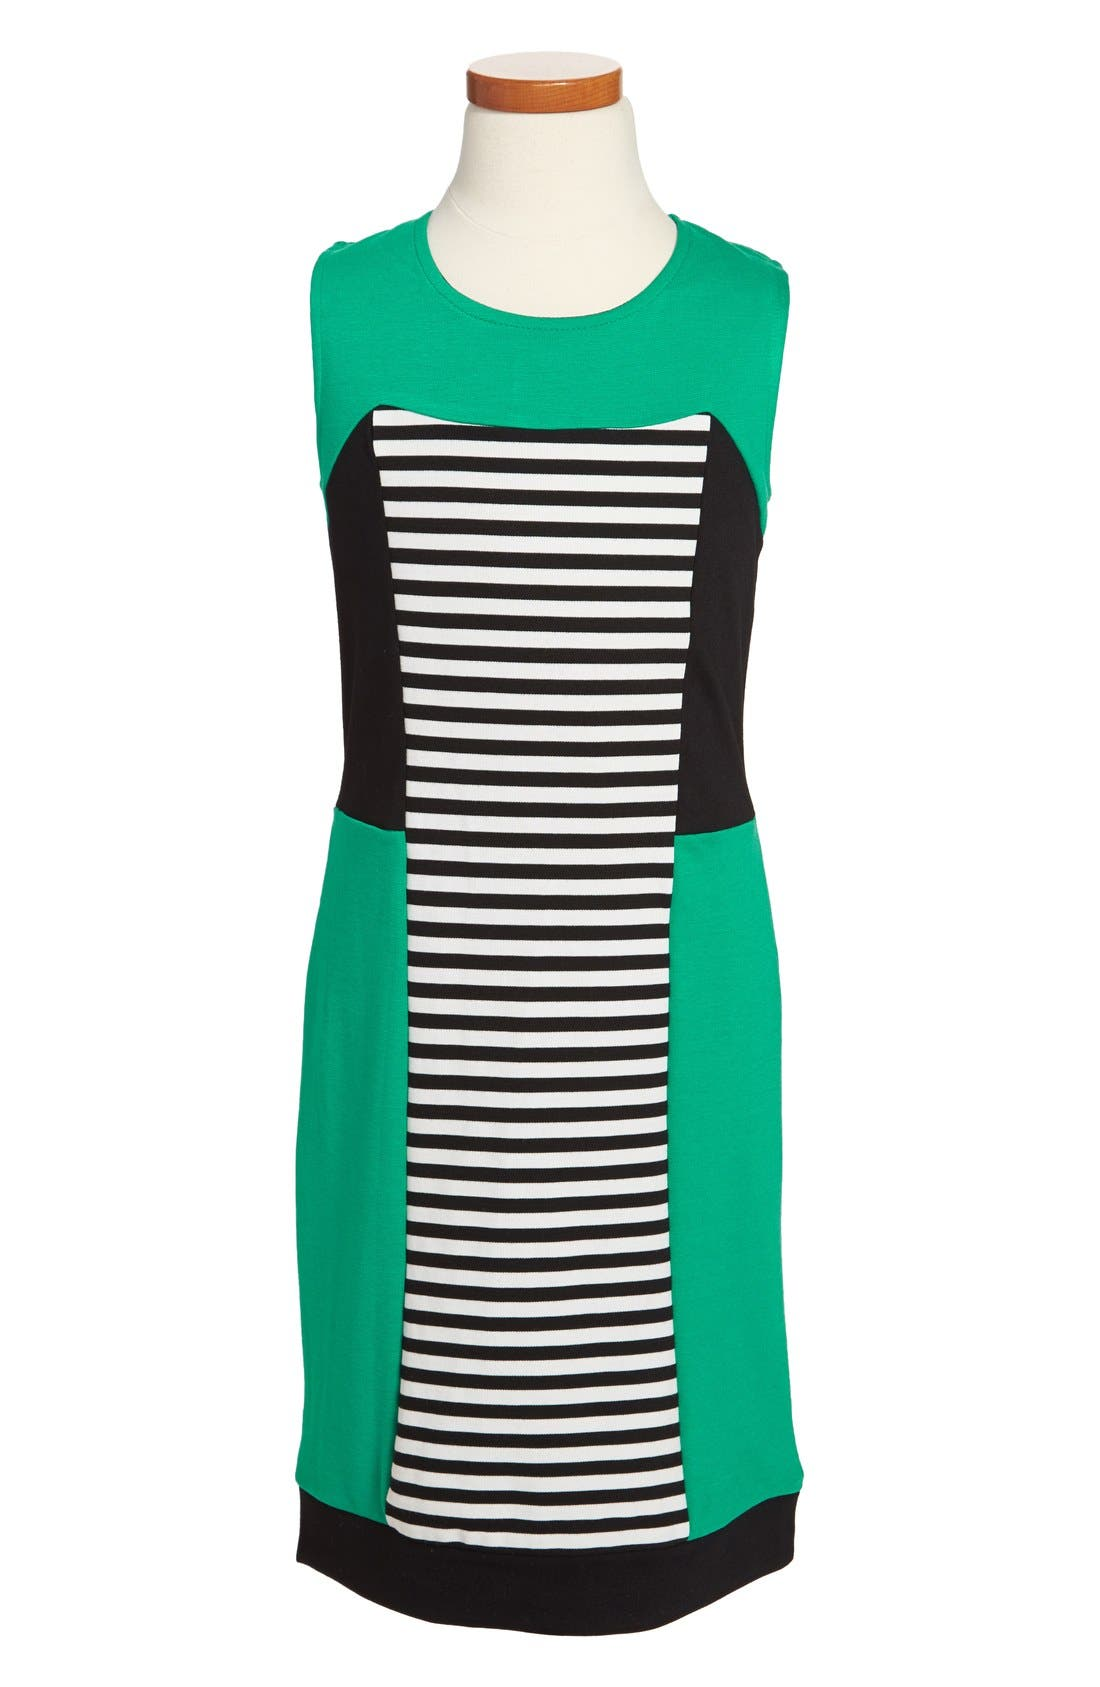 Main Image - Nicole Miller Stripe Colorblock Dress (Big Girls)